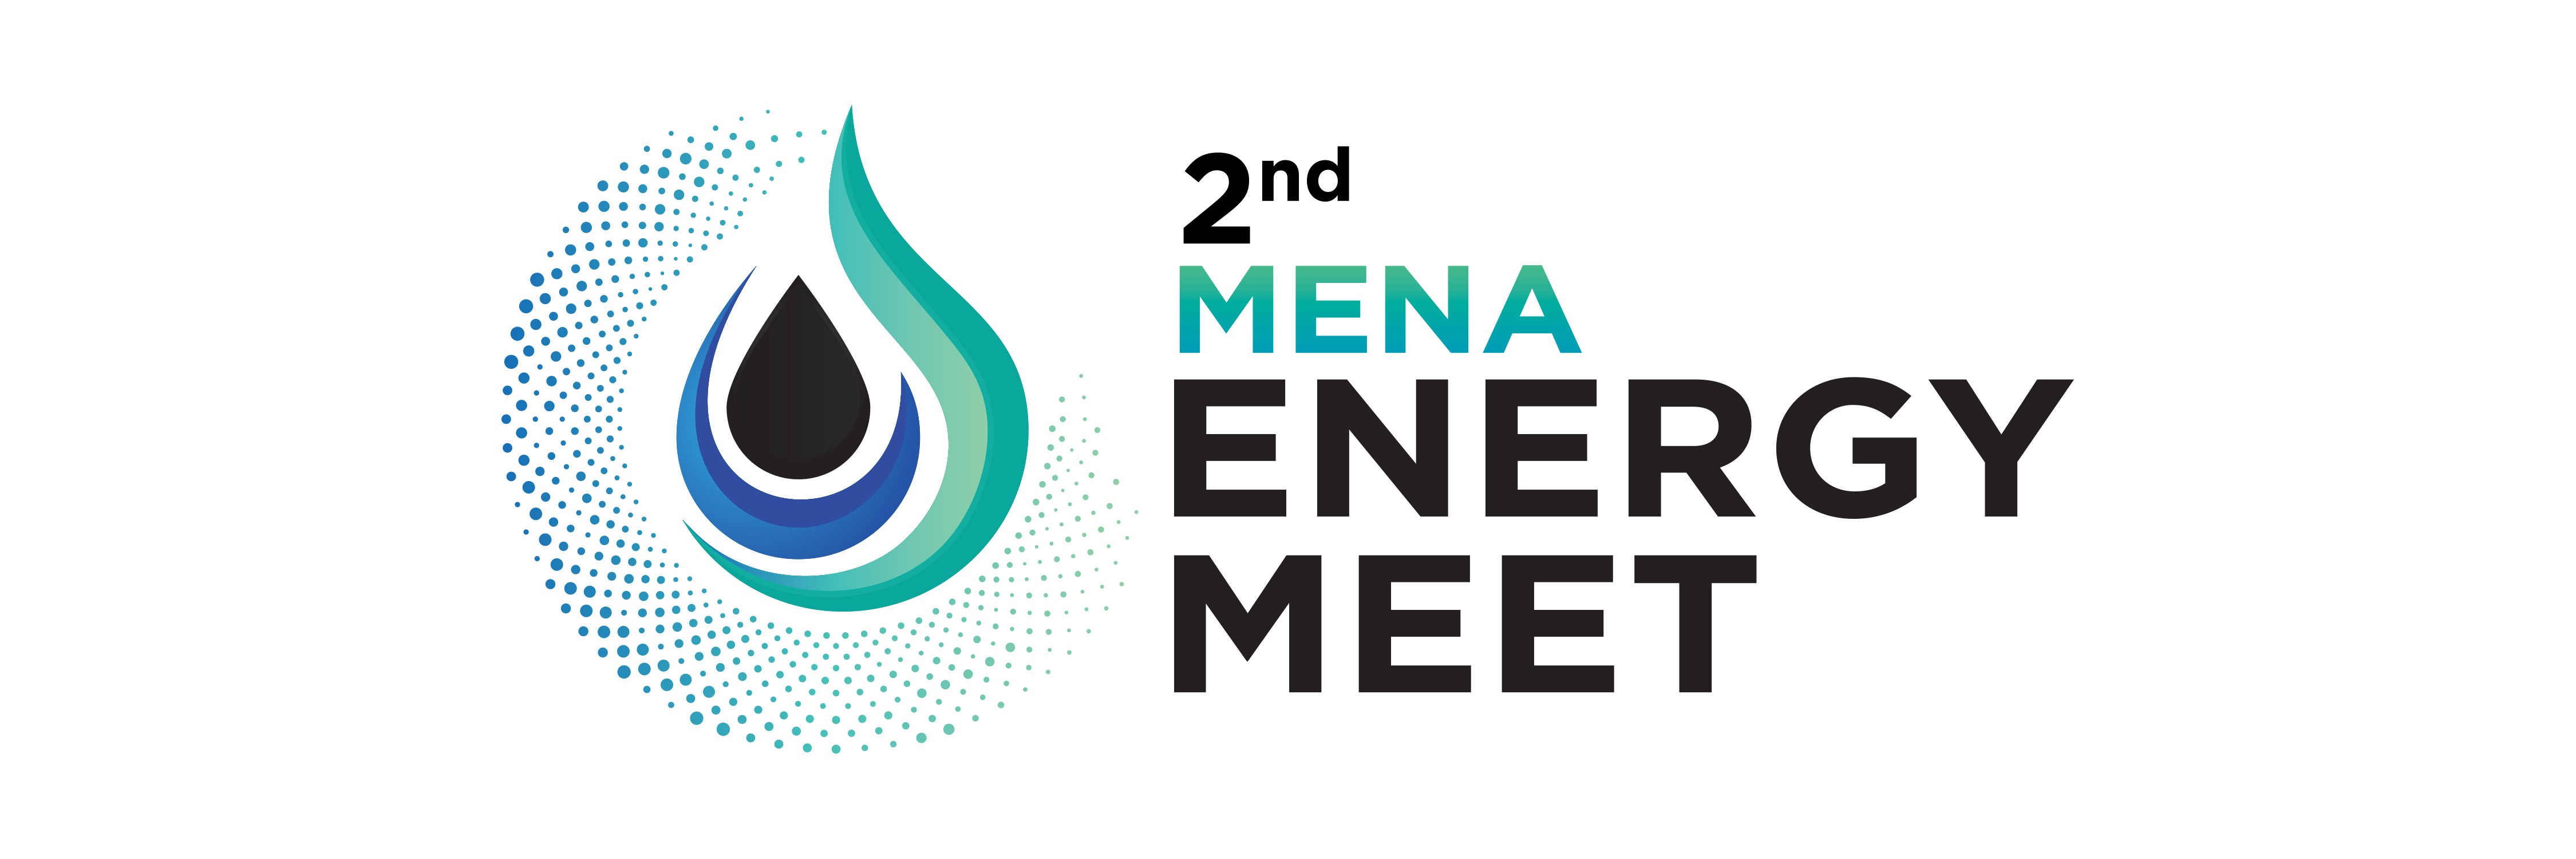 MENA Energy Meet 2nd Edition